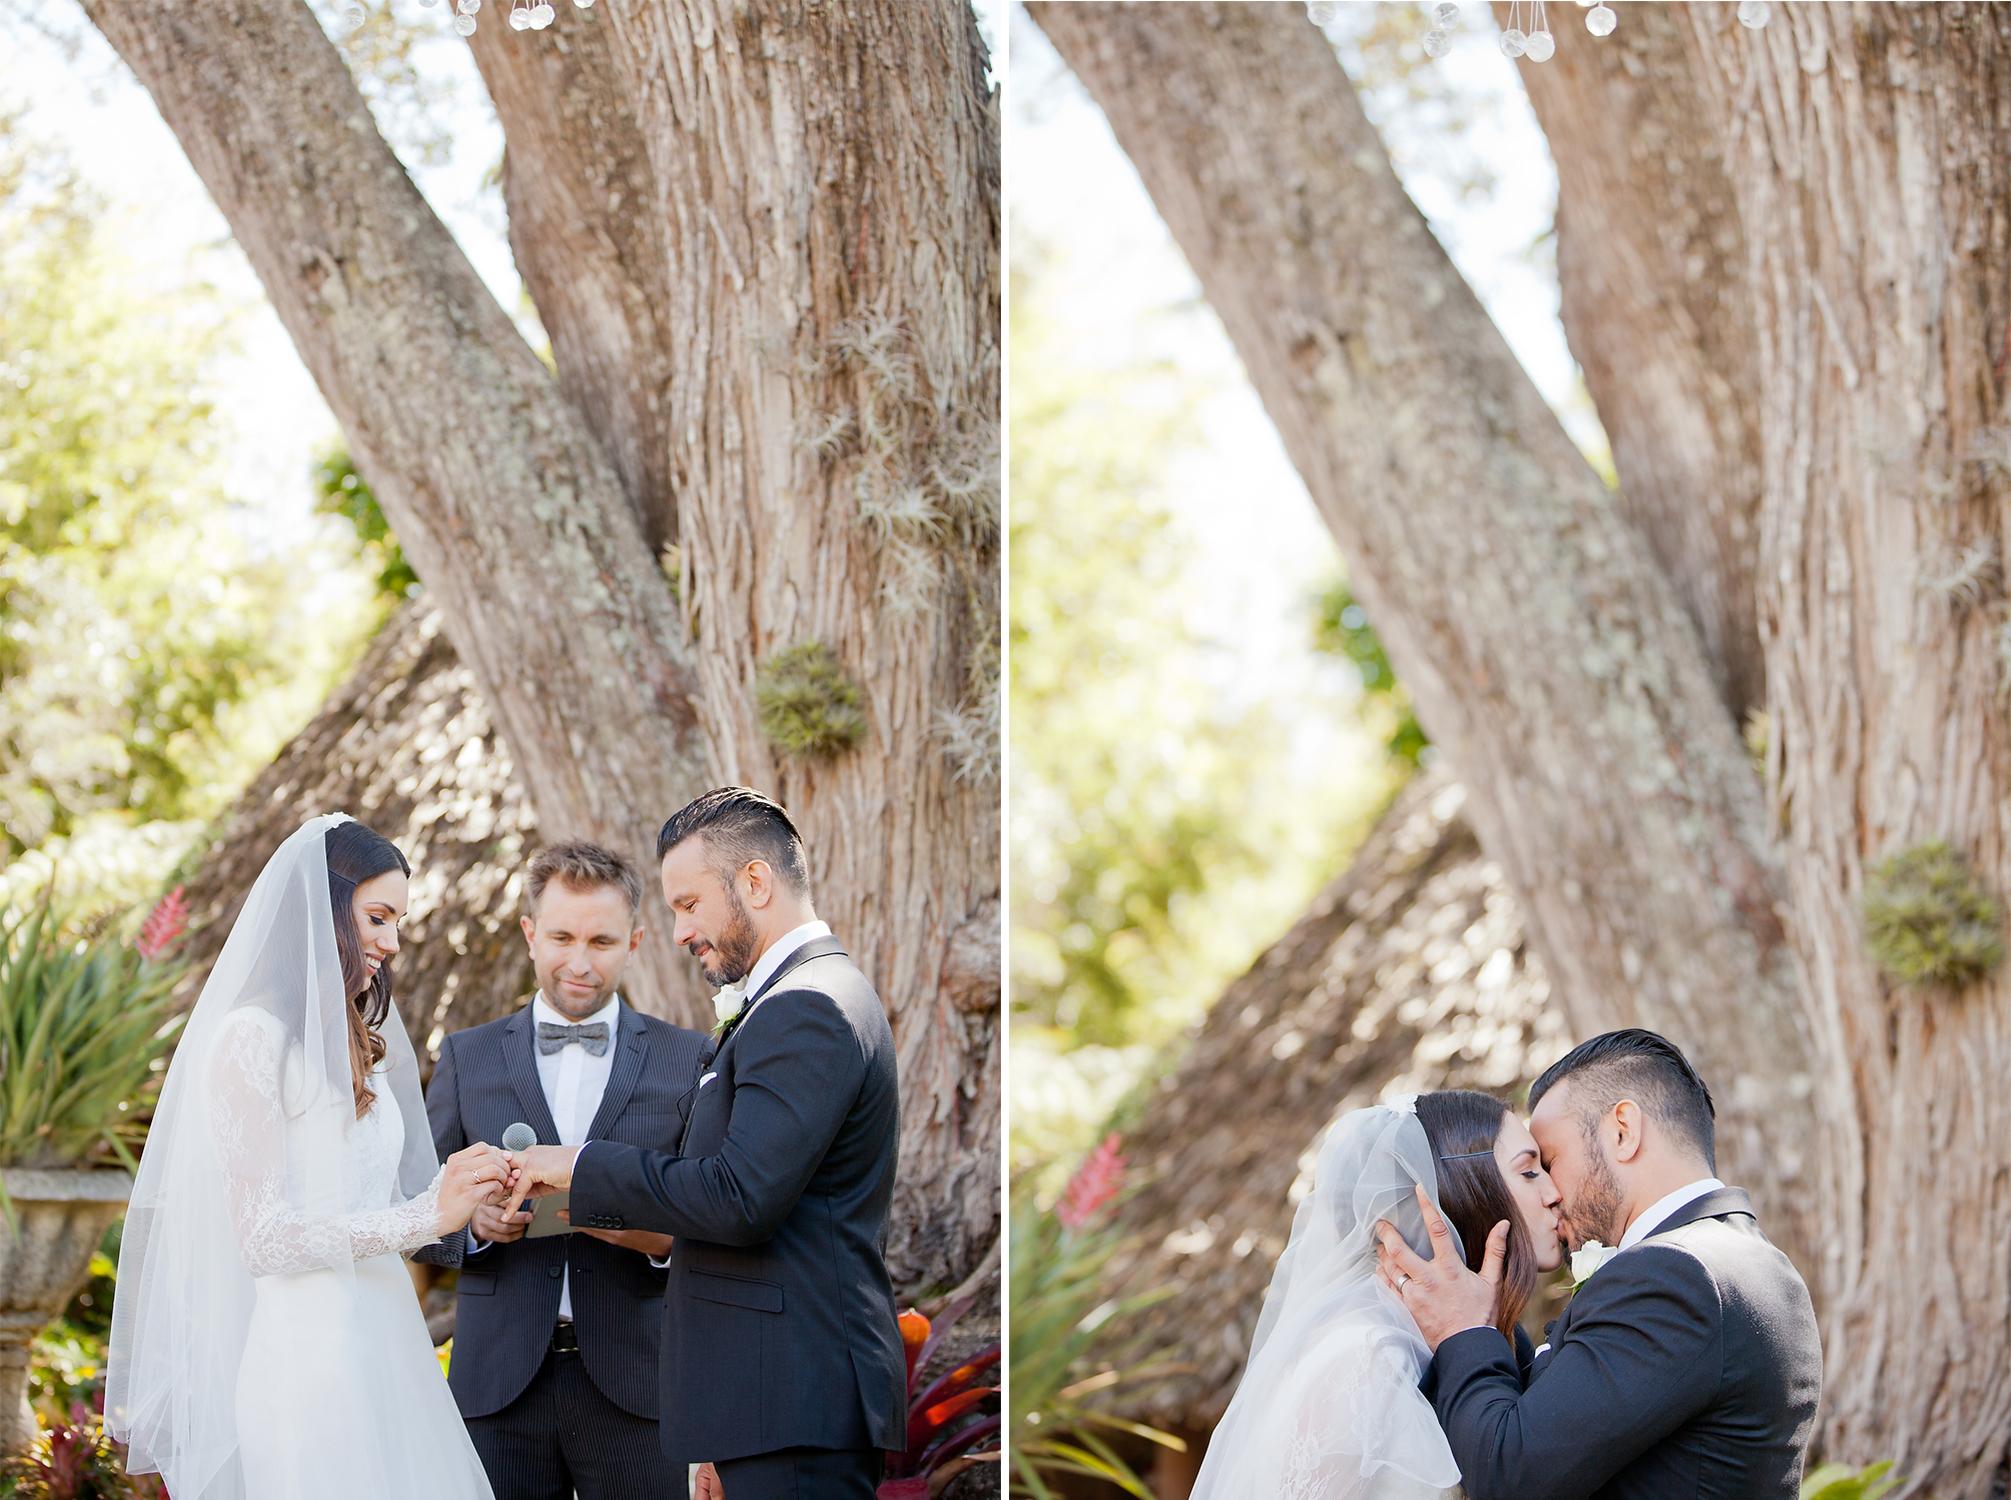 wellington wedding photography NZ - 0794.JPG